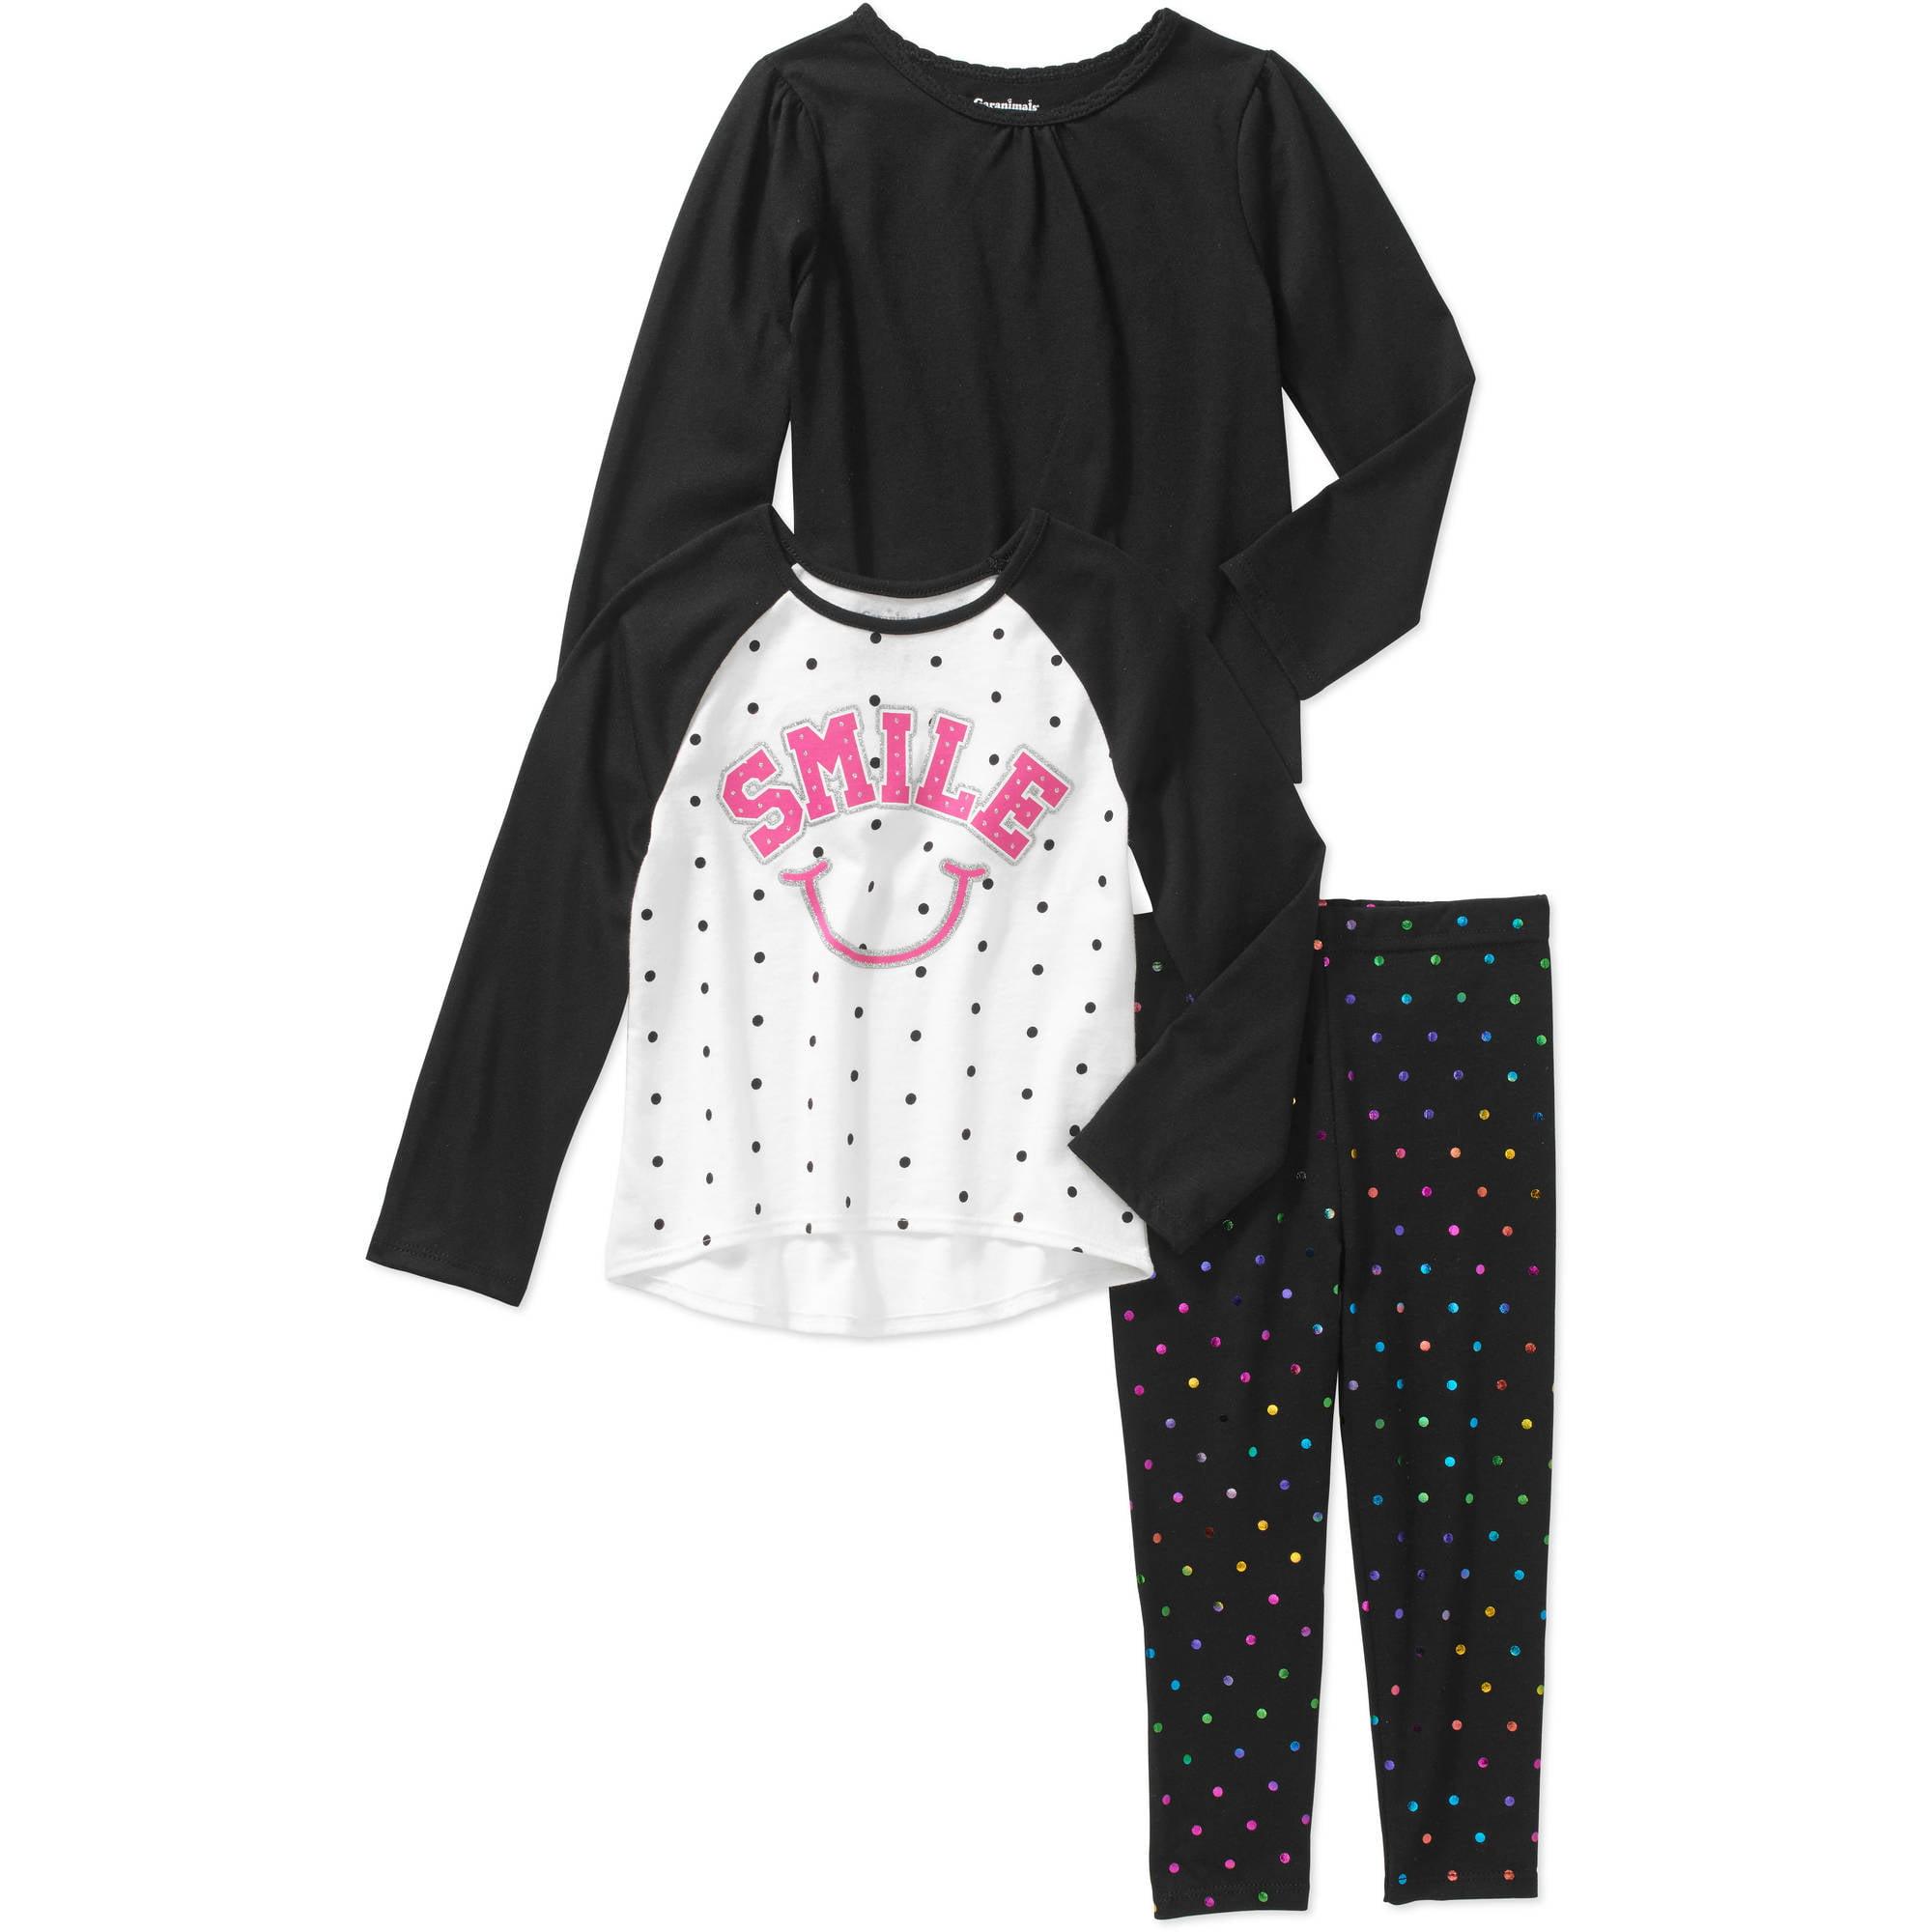 Garanimals Baby Toddler Girl 3 Piece Long Sleeve Solid Tee, Printed Tee and Printed Leggings Set